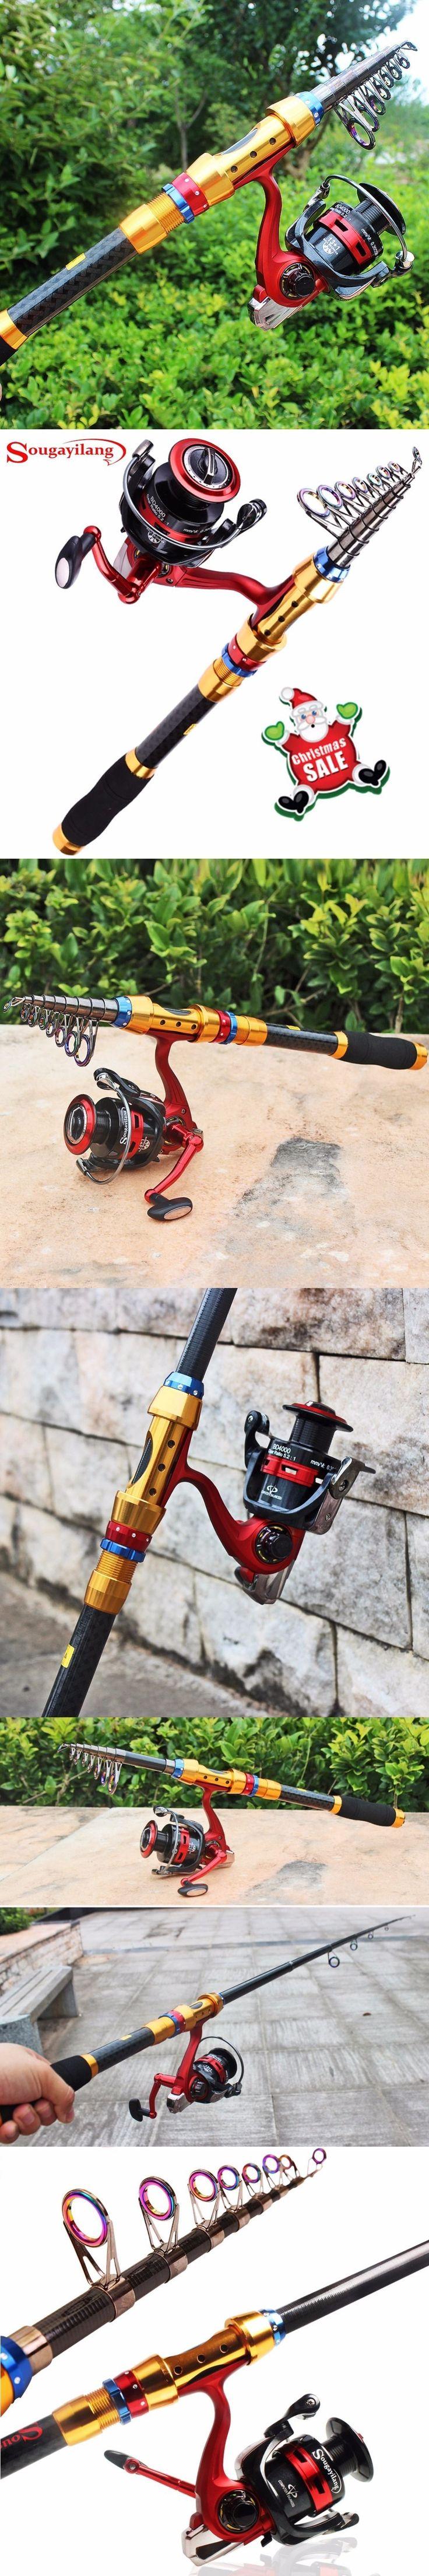 Sougayilang 1.8-3m Telescopic Fishing Rod and 13+1BB Fishing Reel Wheel Carbon Fiber Fishing Rod Spinning Fishing Reel Combo #fishingrod